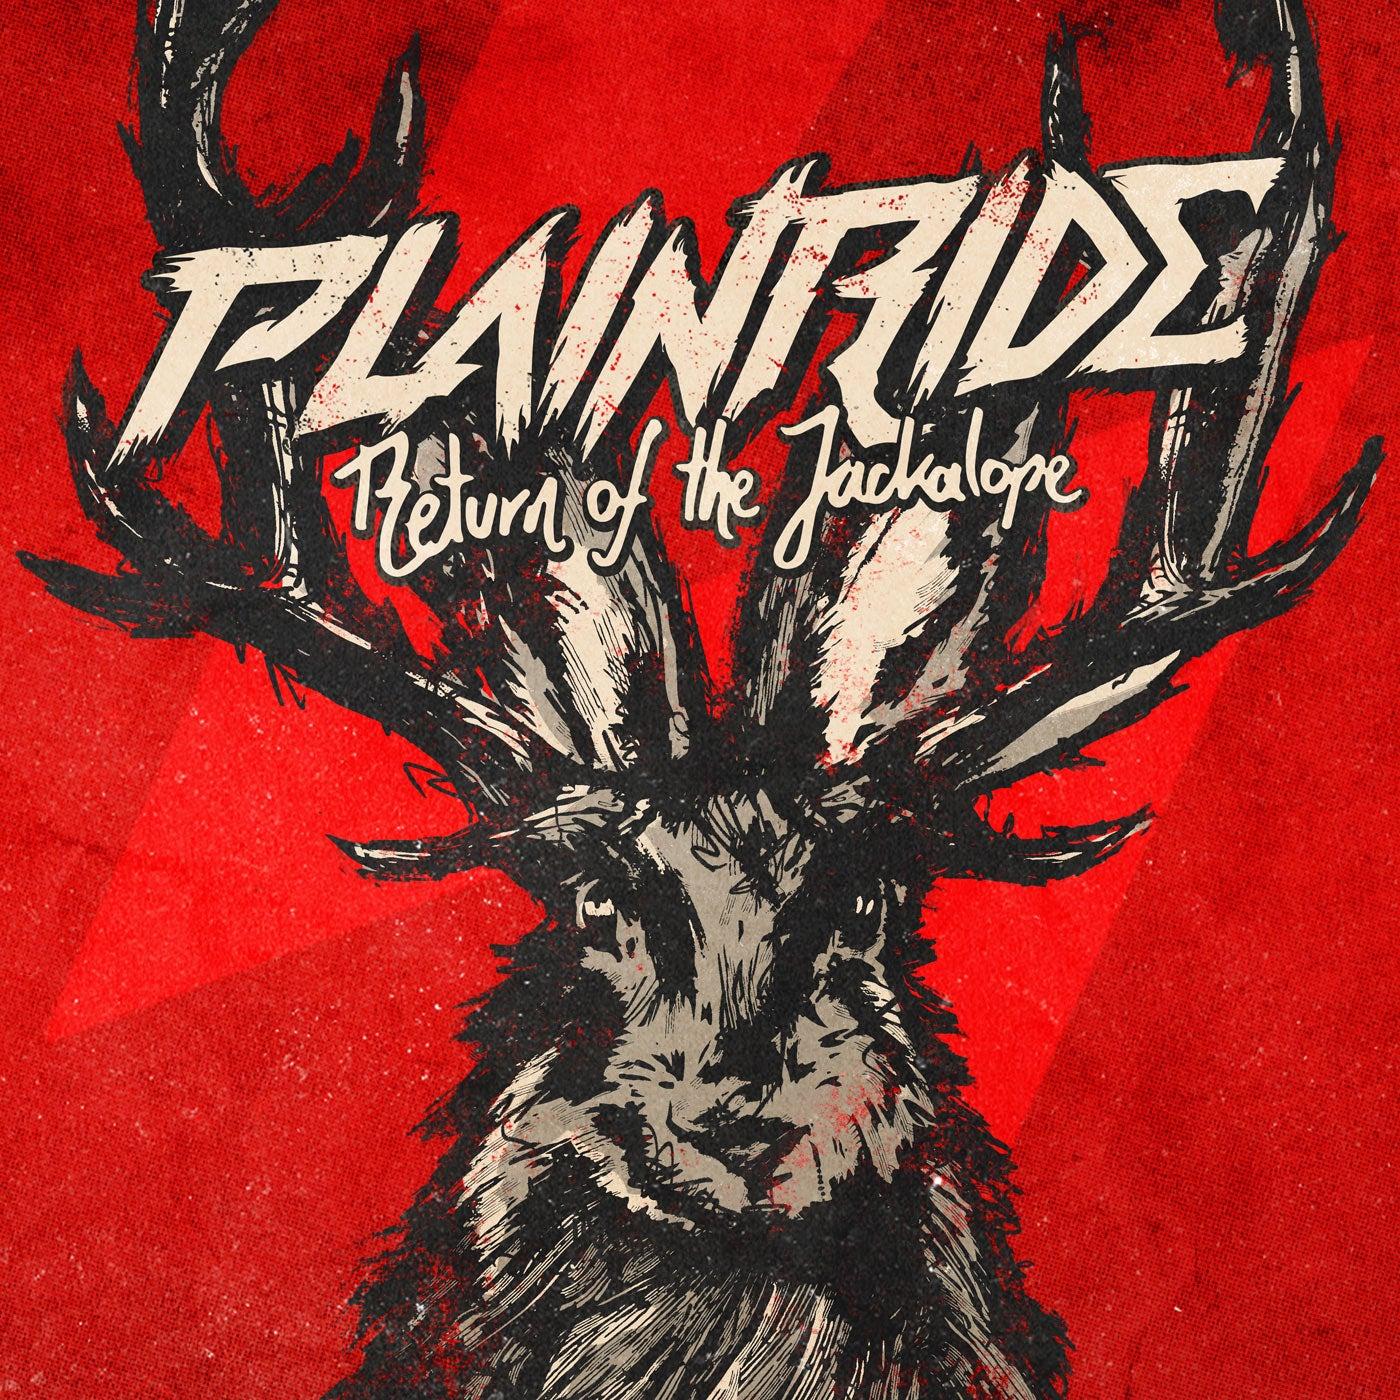 Image of Plainride - Return of the Jackalope CD